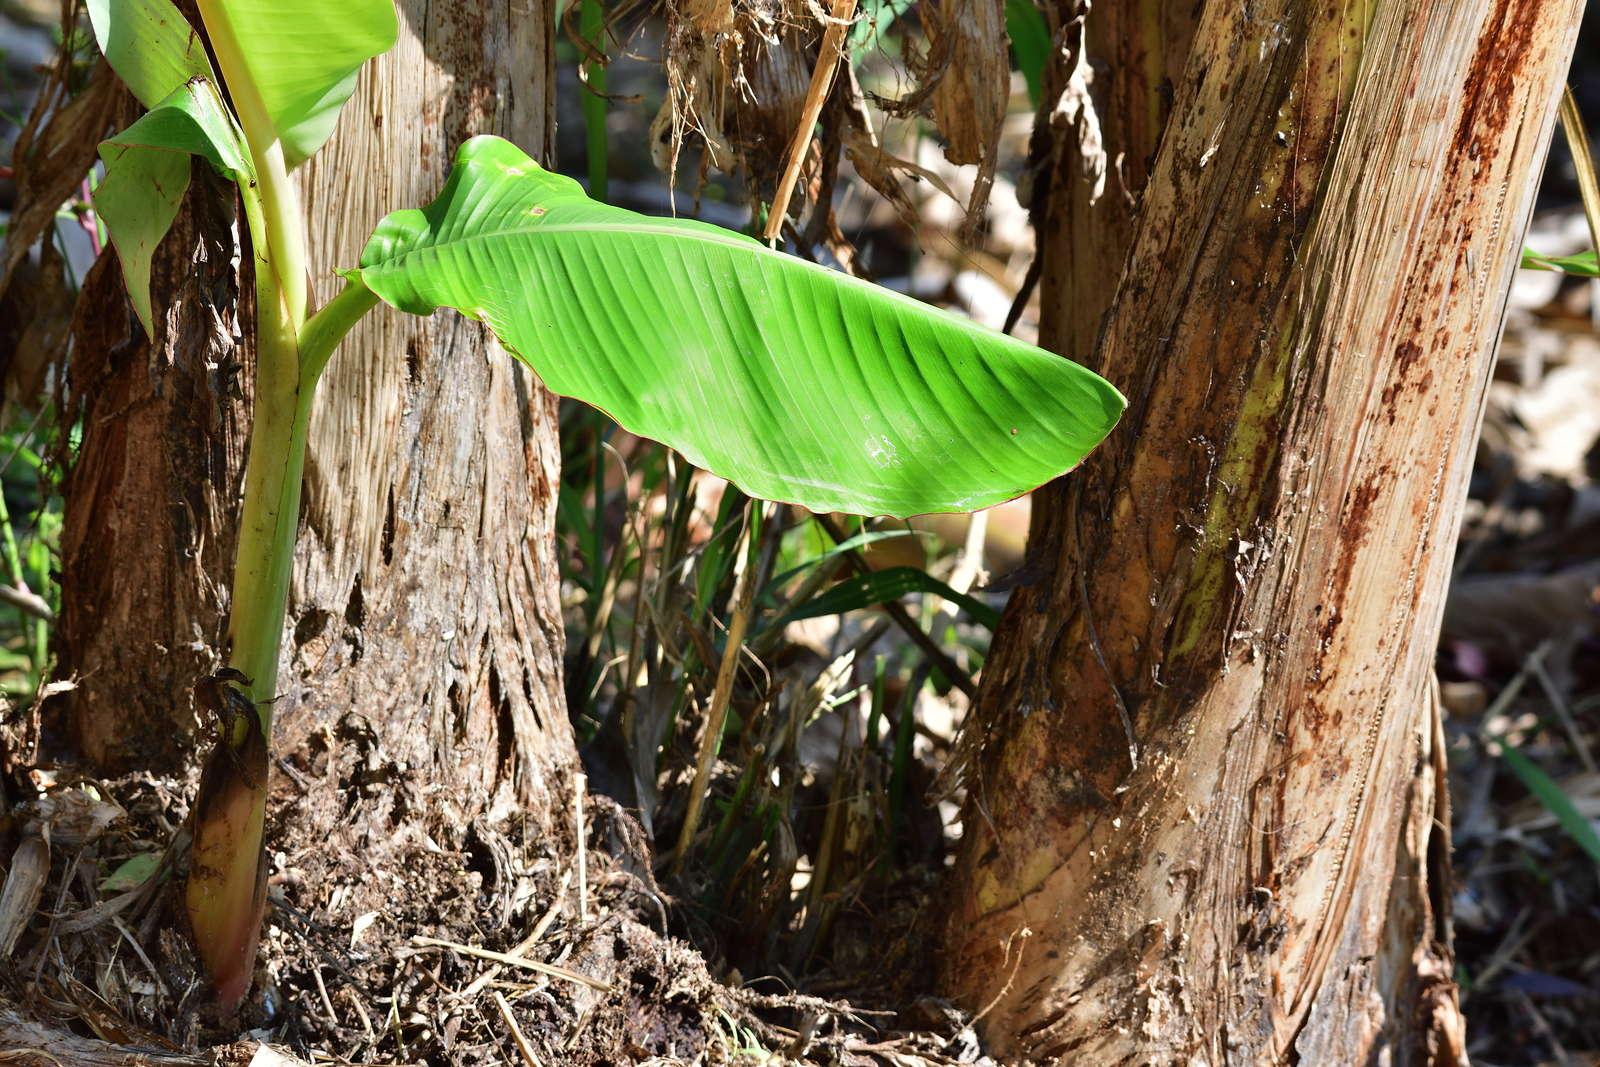 bananenpflanze im eigenen garten pflanzen pflegen plantura. Black Bedroom Furniture Sets. Home Design Ideas